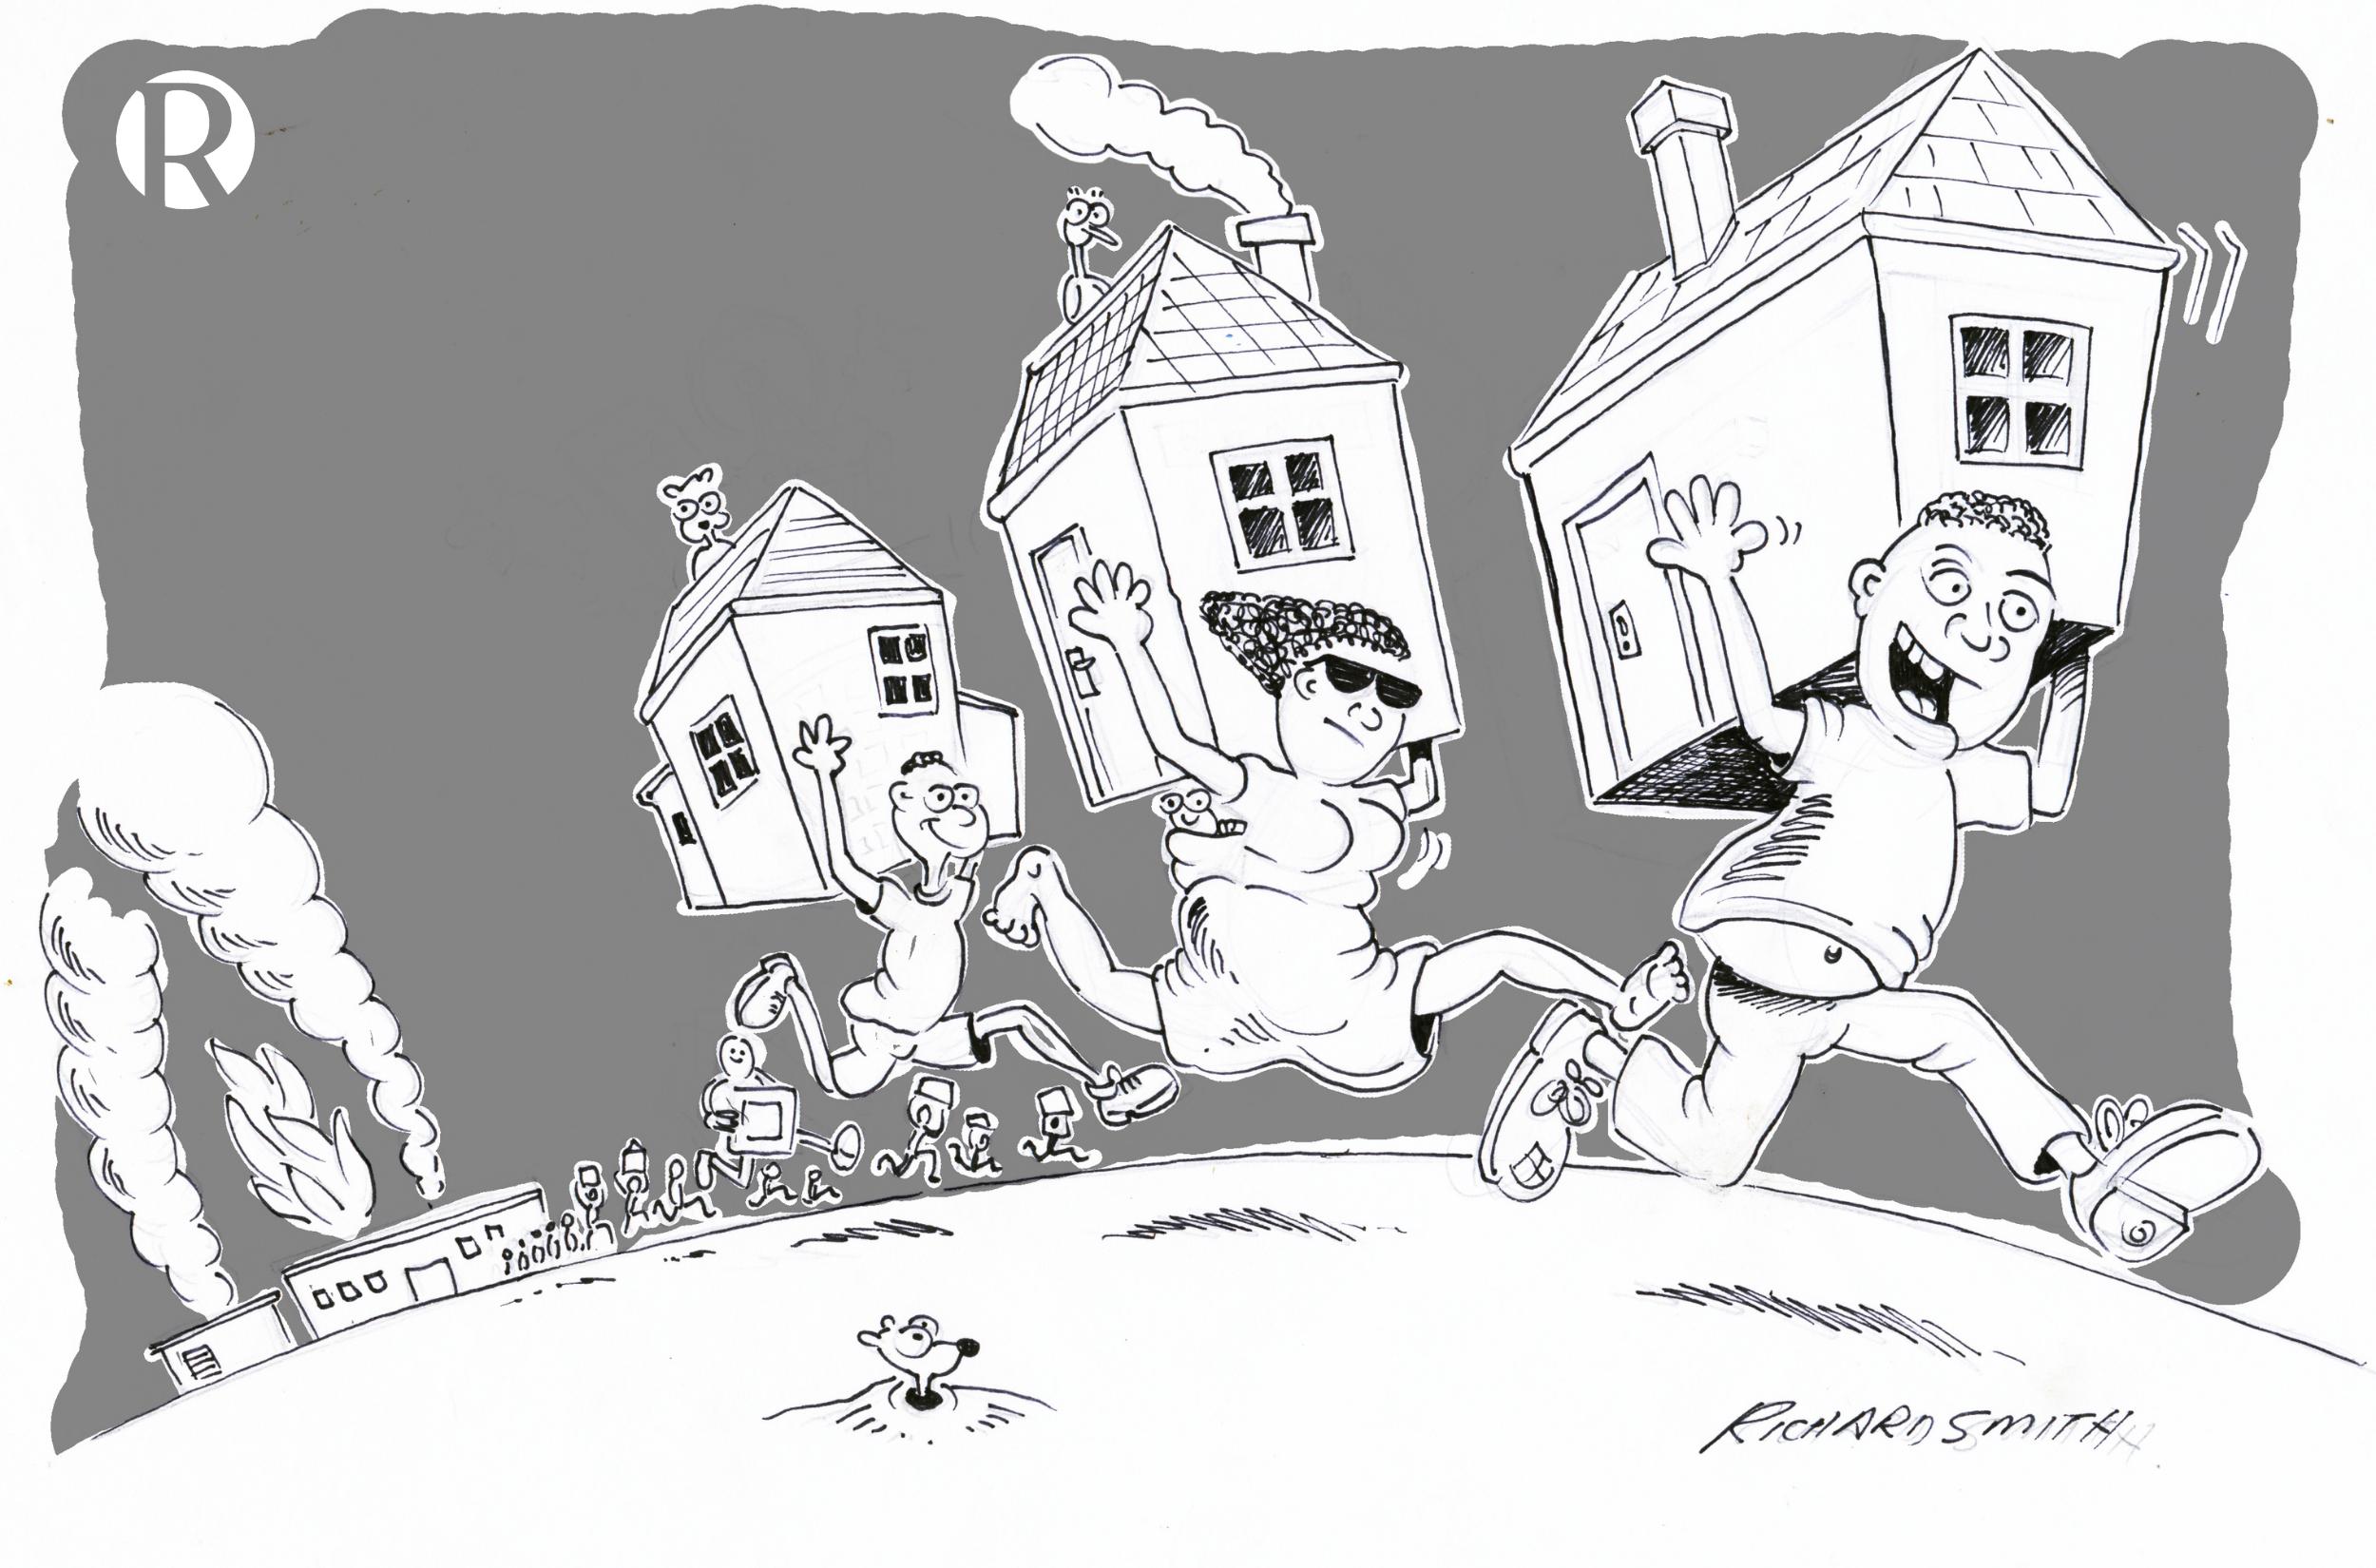 Richard Smith Cartoon EWC Looting Houses RS Grey